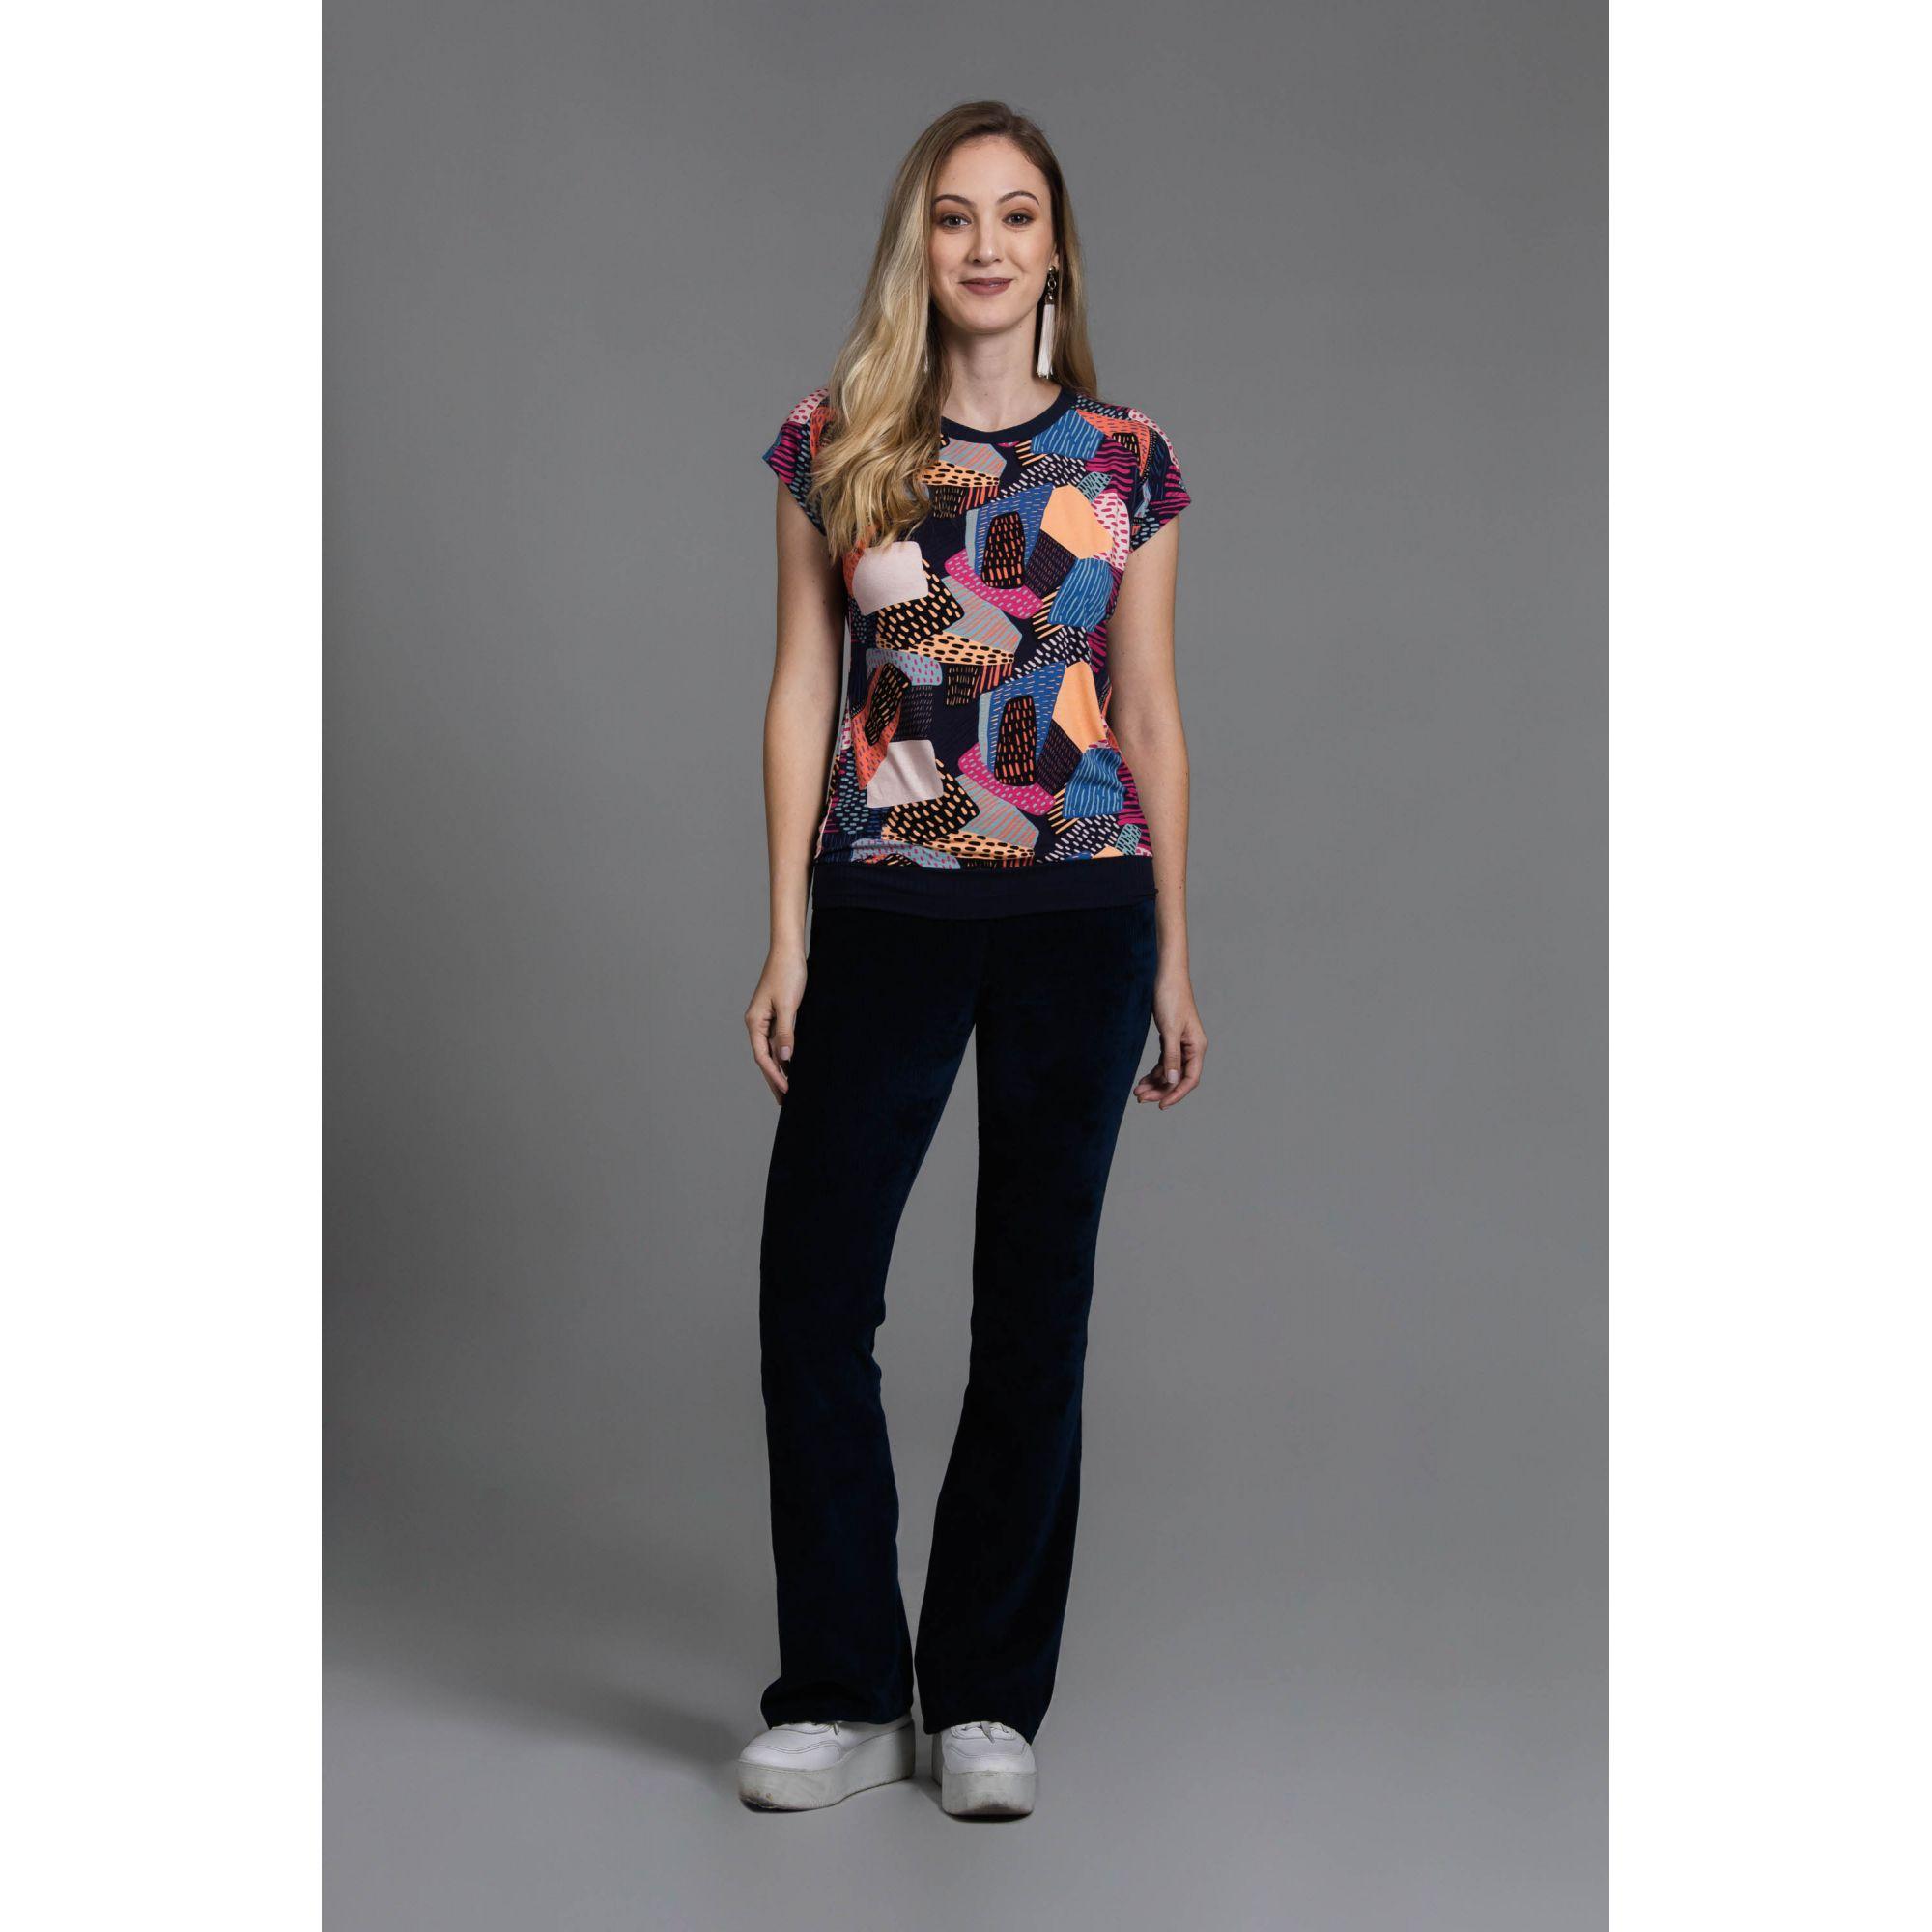 Blusa Formas Coloridas Plus Size